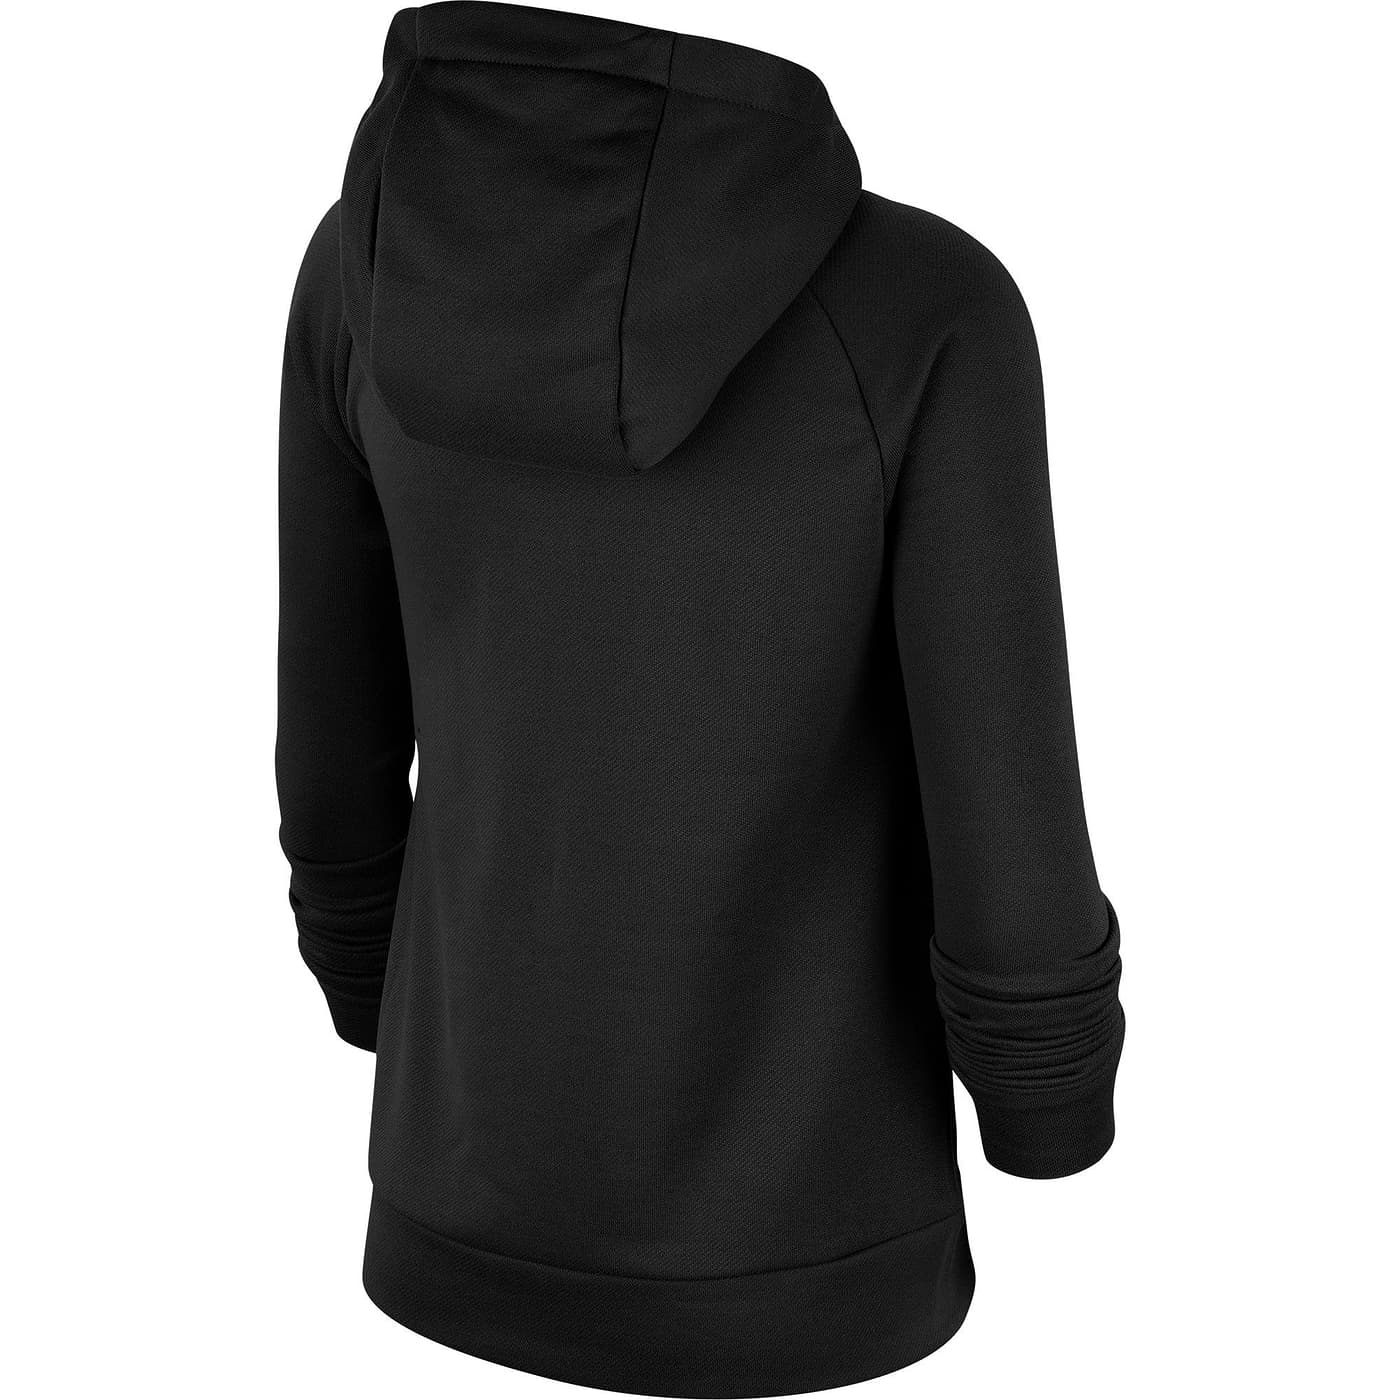 Nike Boys' Training Pullover Hoodie Pull over à capuche pour garçon